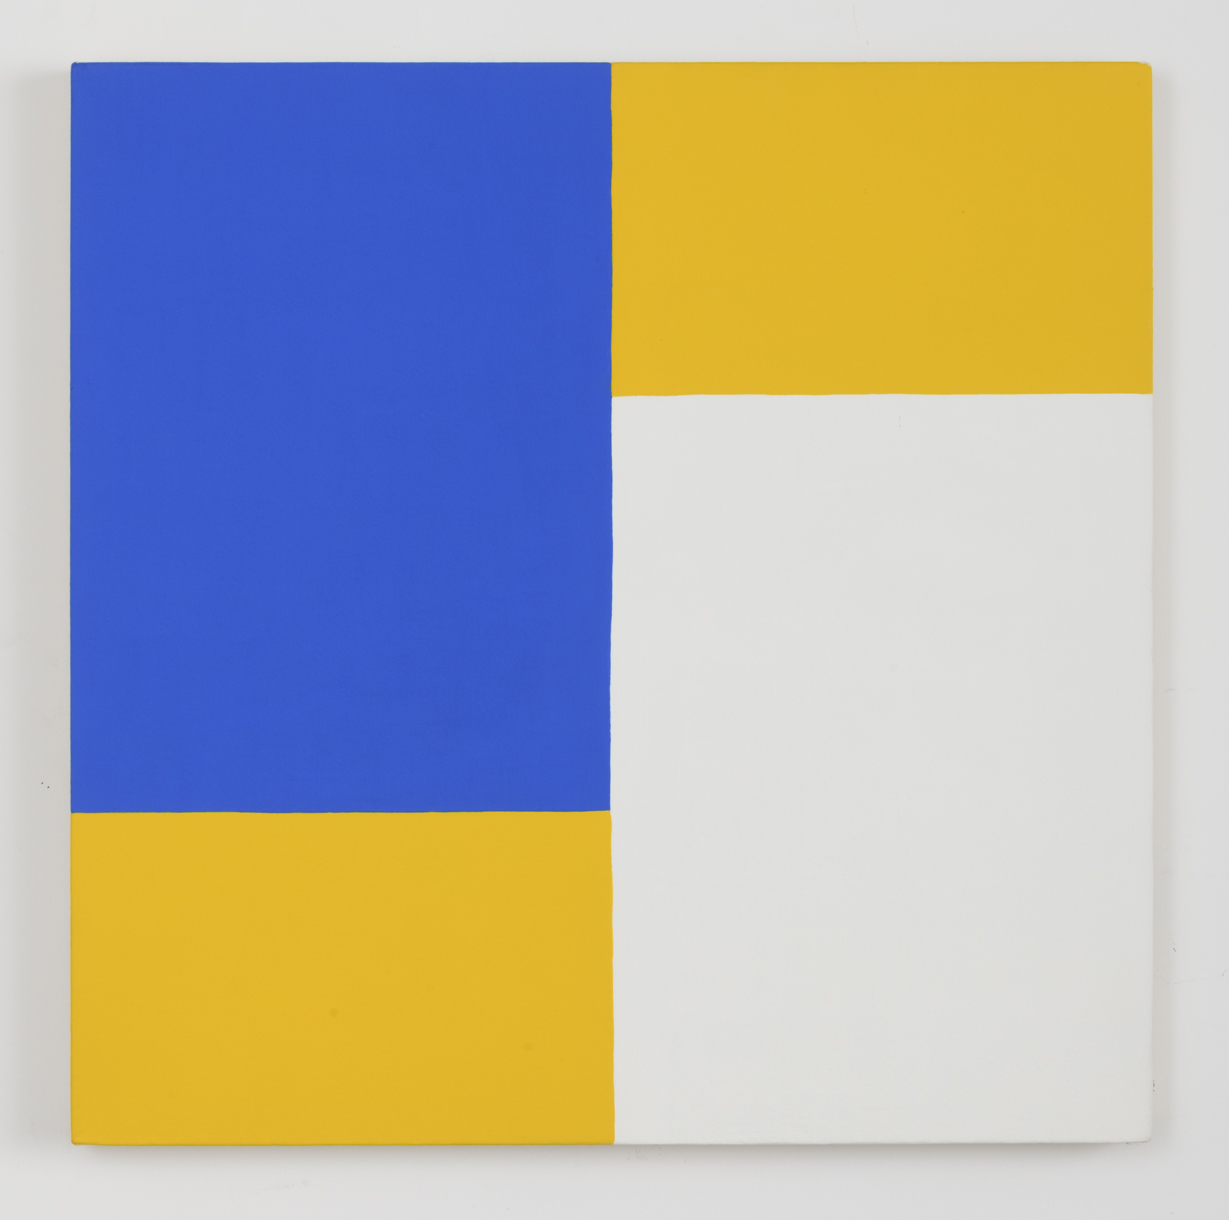 Edith Baumann  Untitled #1,  1977 acrylic on canvas 26 - 1/4 x 26 -1/4 inches